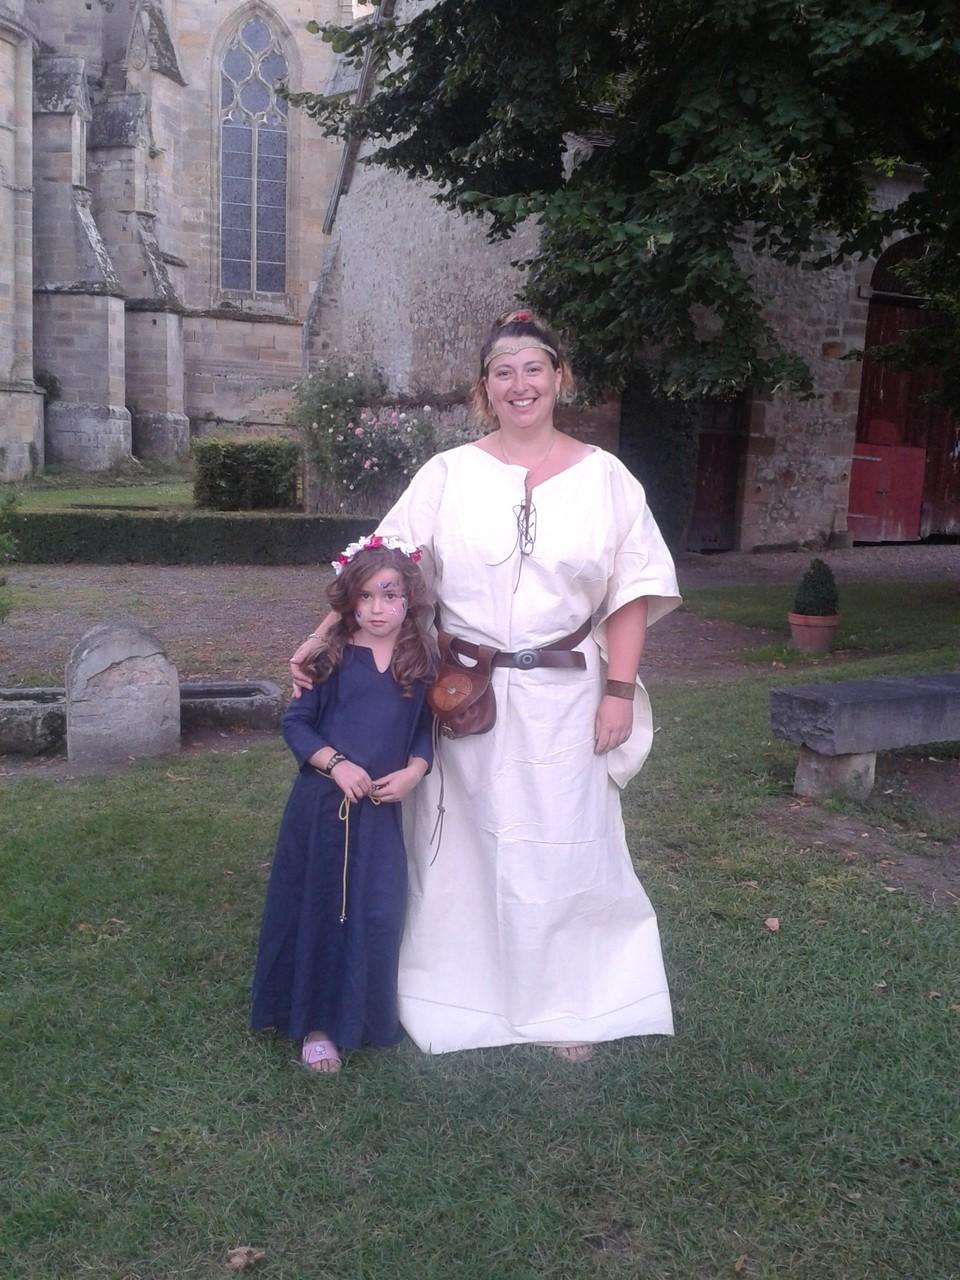 Robe médiévale femme et enfant - Médiévales Souvigny 2014 - Nathalie Navarro Créations